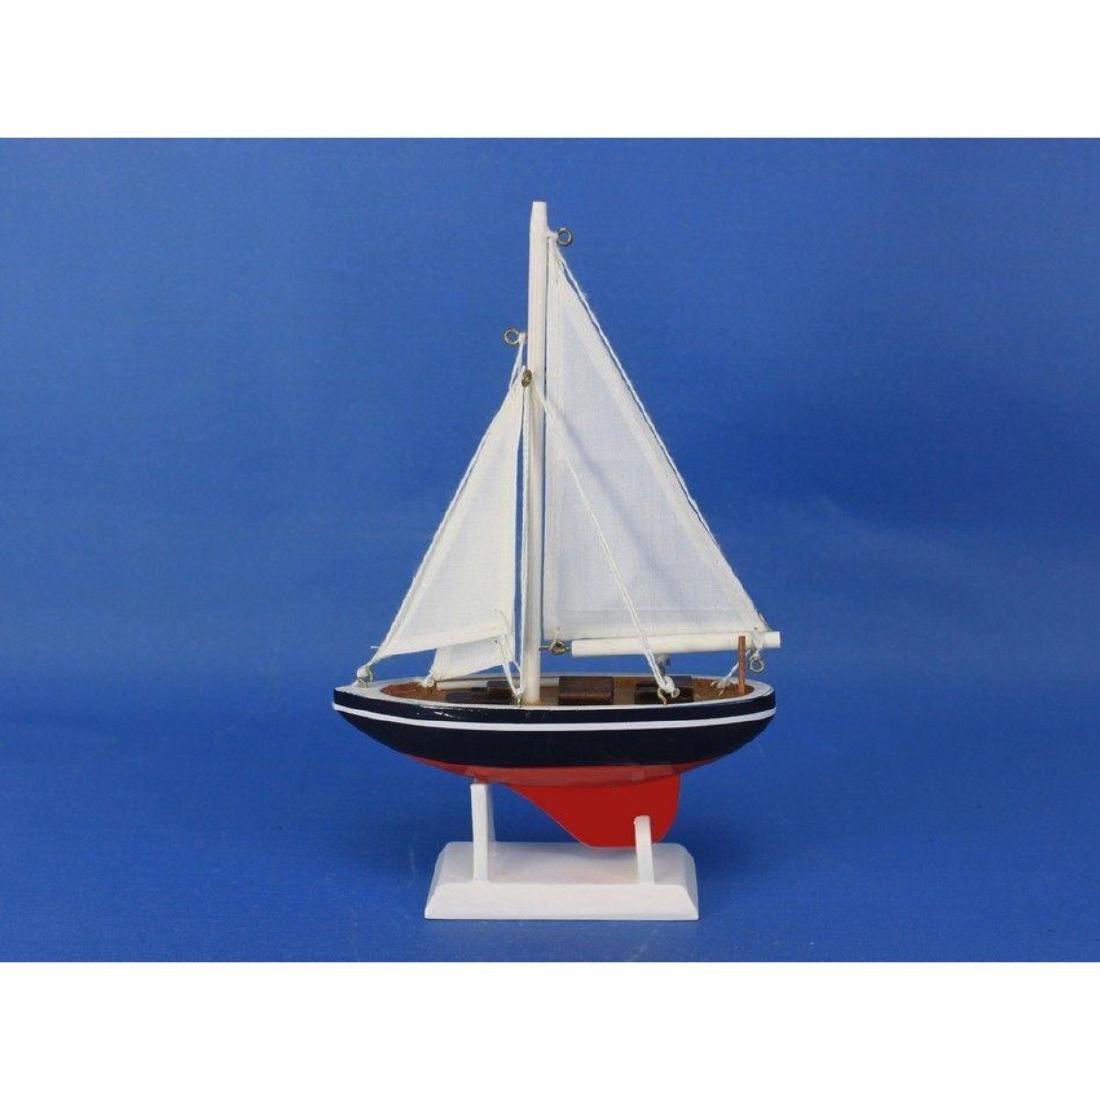 "Wooden American Sailer Model Sailboat Decoration 9"" - 7"